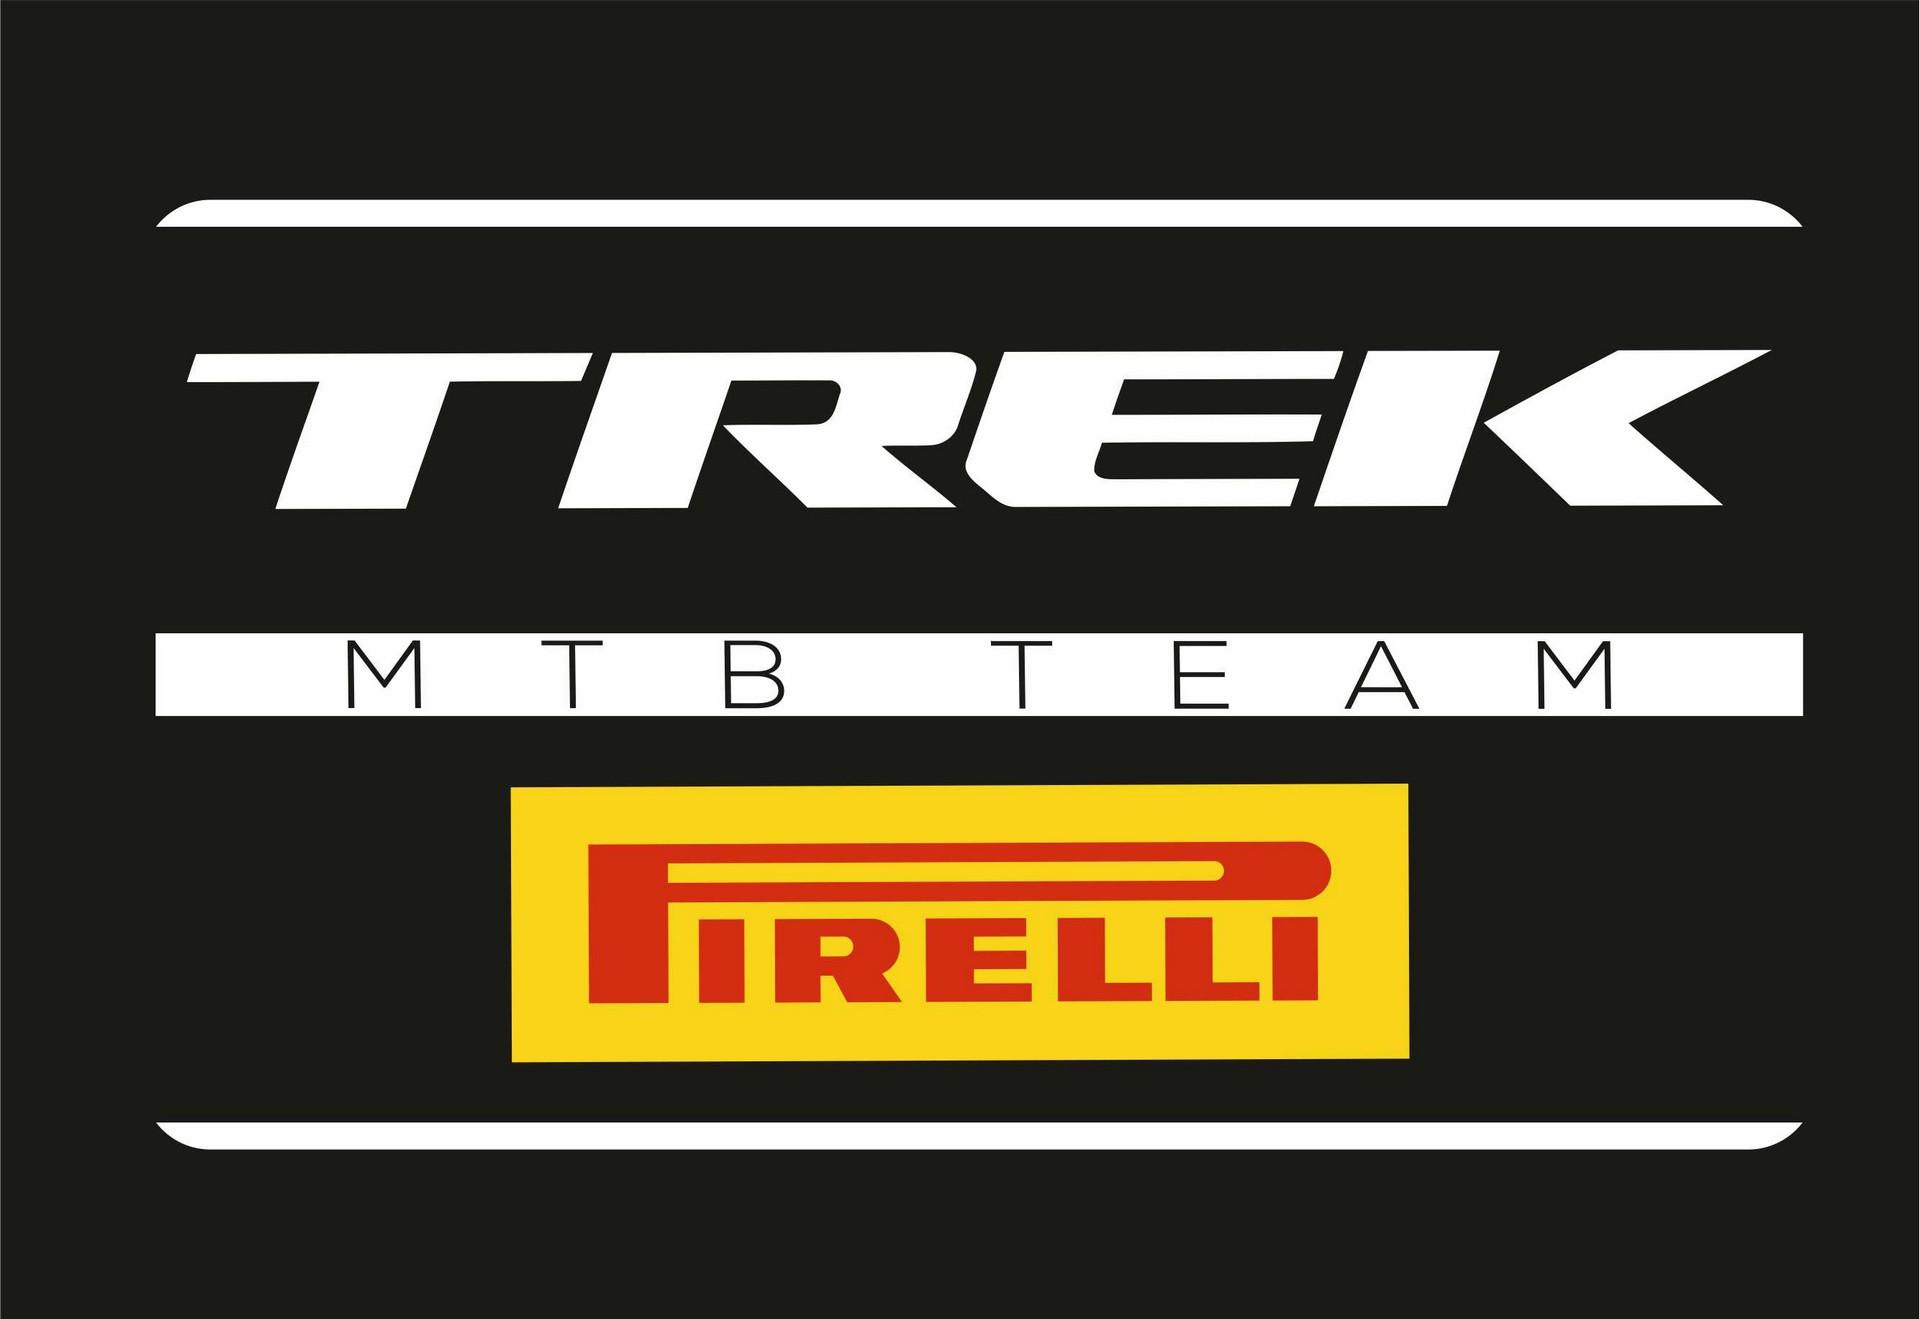 Team Trek Pirelli